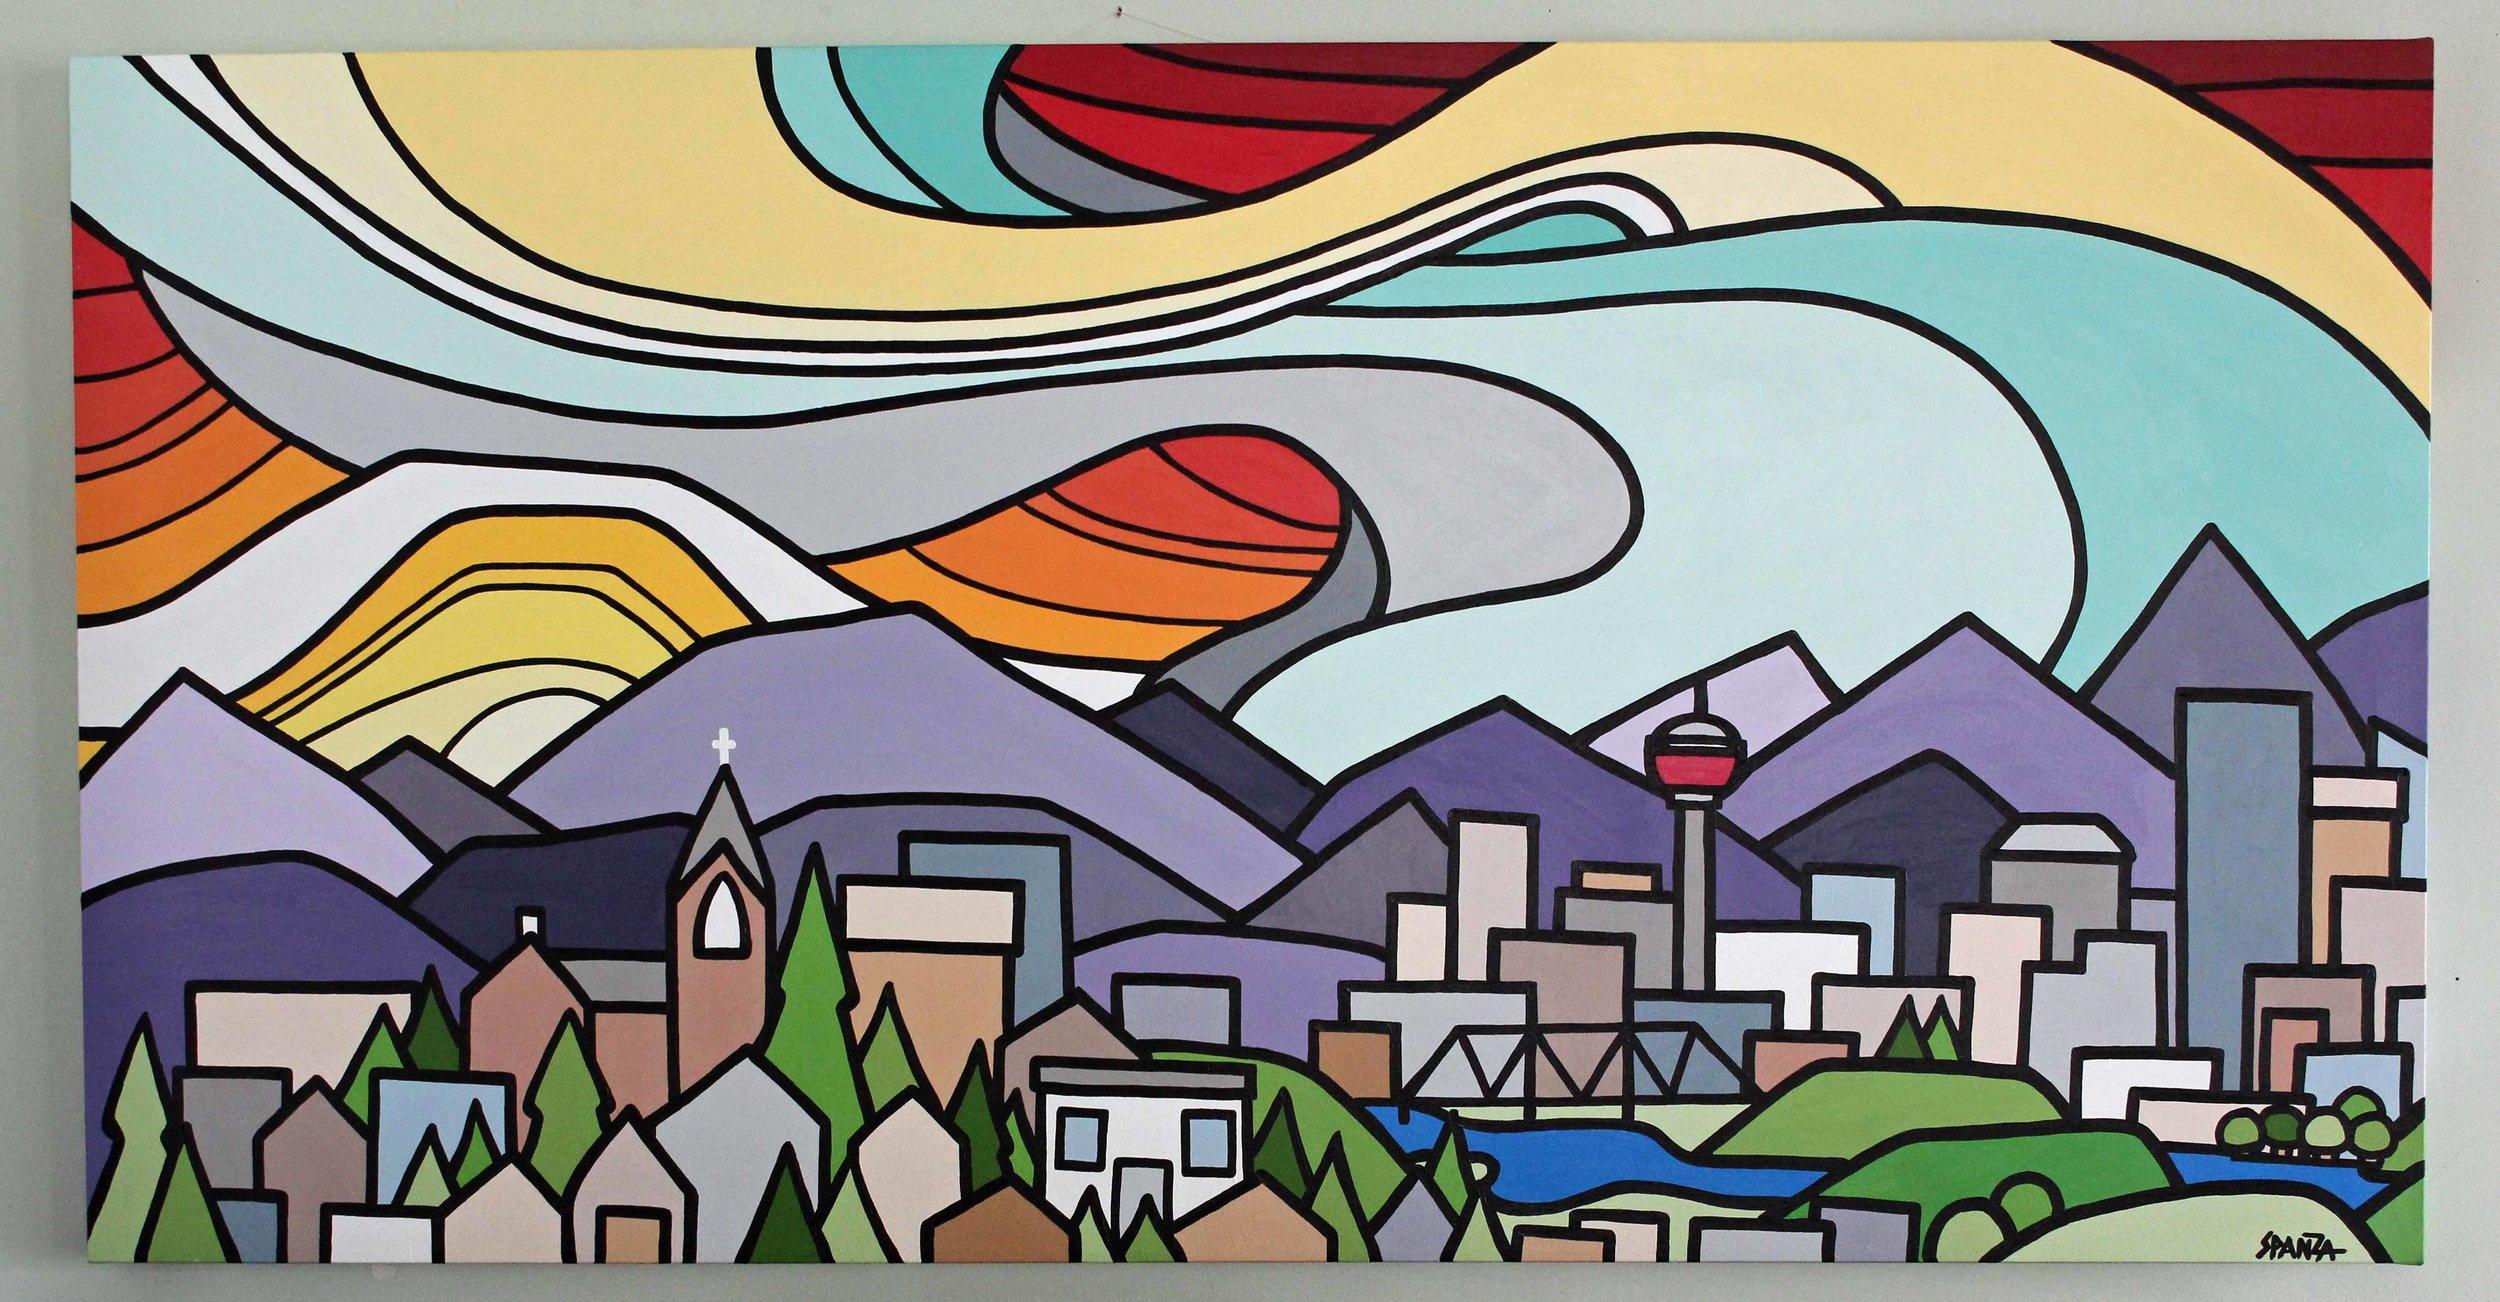 "Calgary 30"" x 60"" Commission"